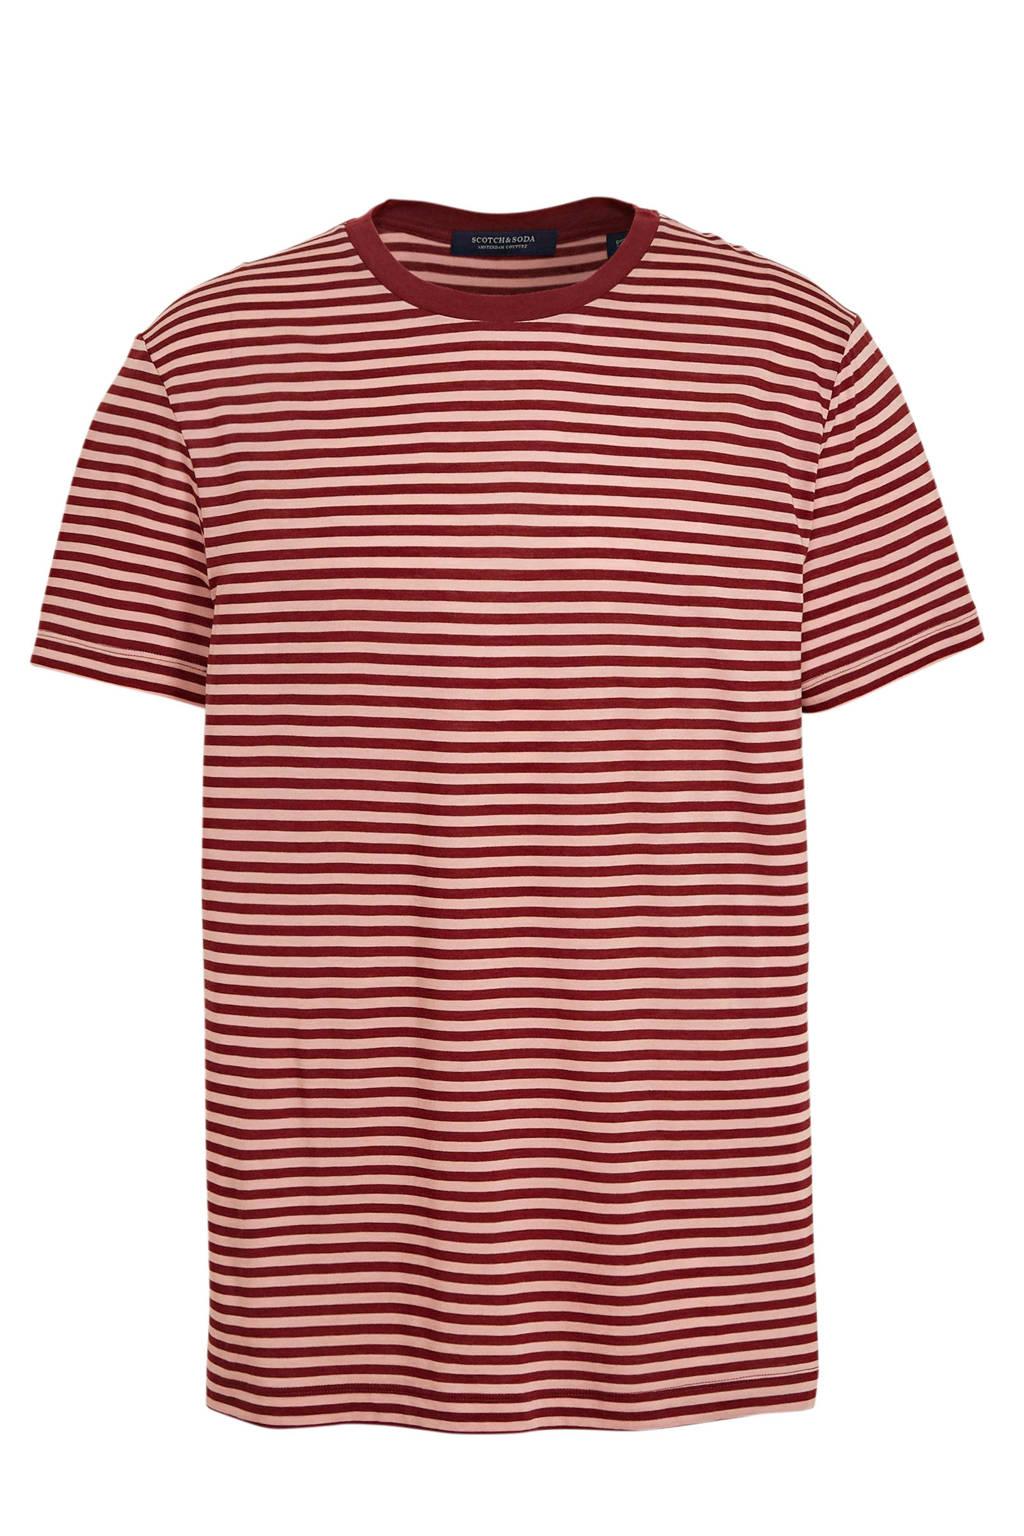 Scotch & Soda gestreept T-shirt rood/roze, Rood/roze